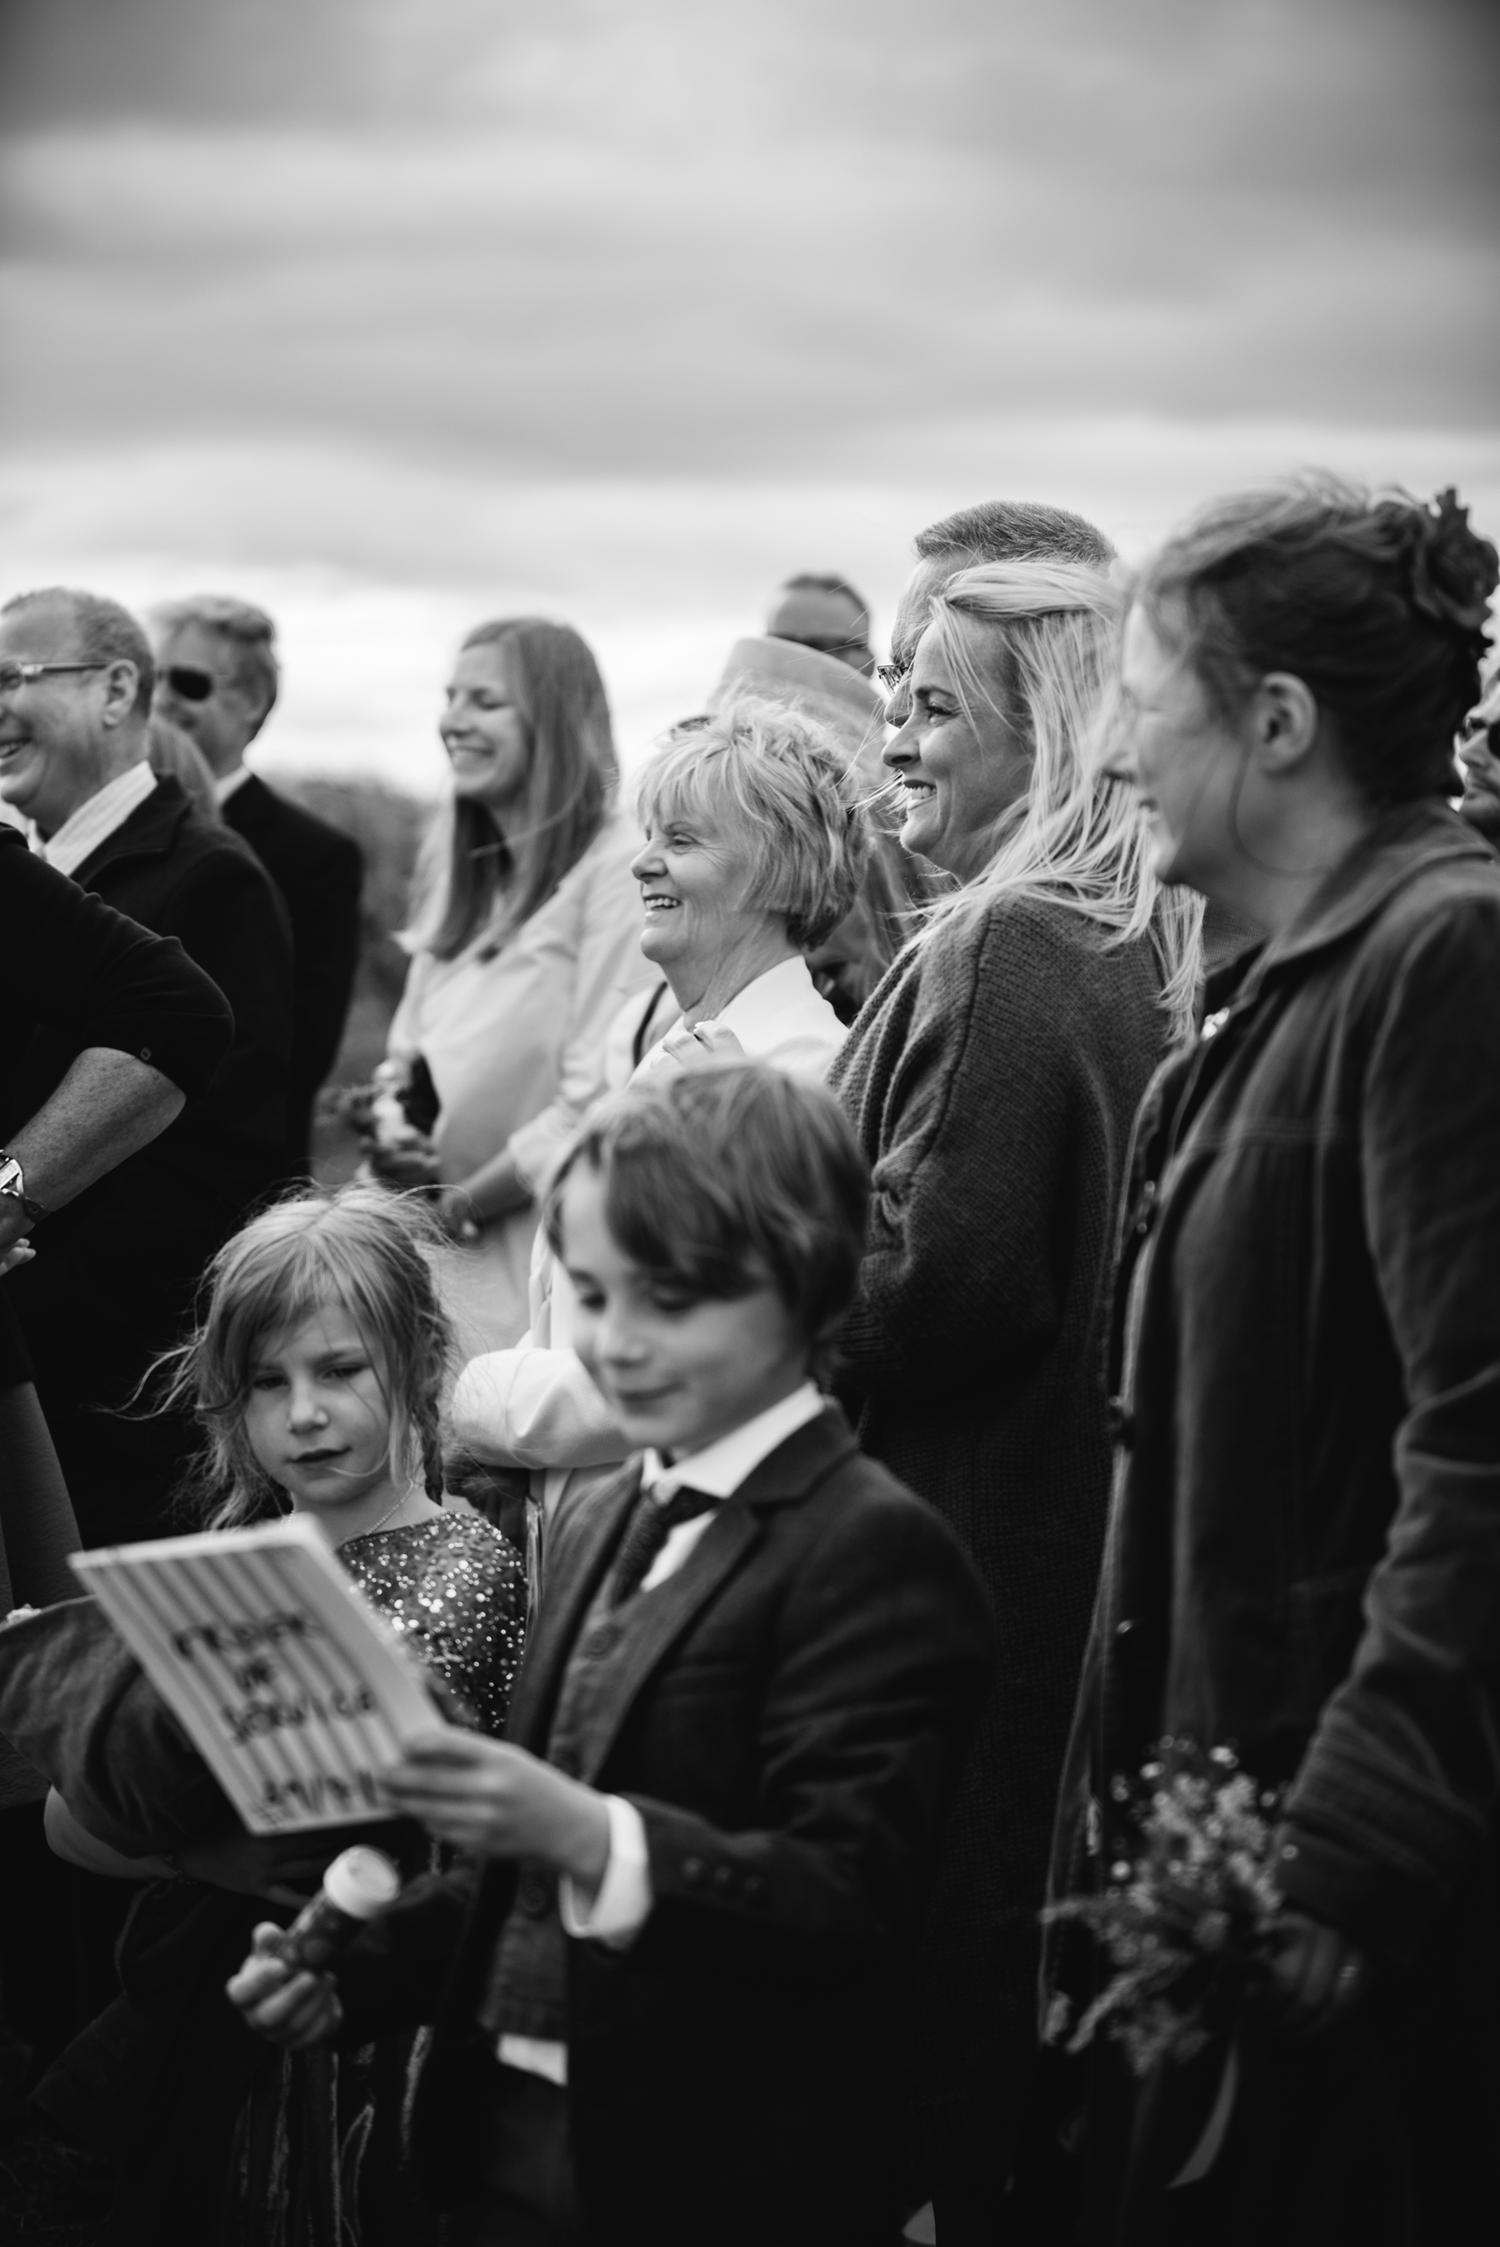 Cliff-top-wedding-scotland-0104.jpg